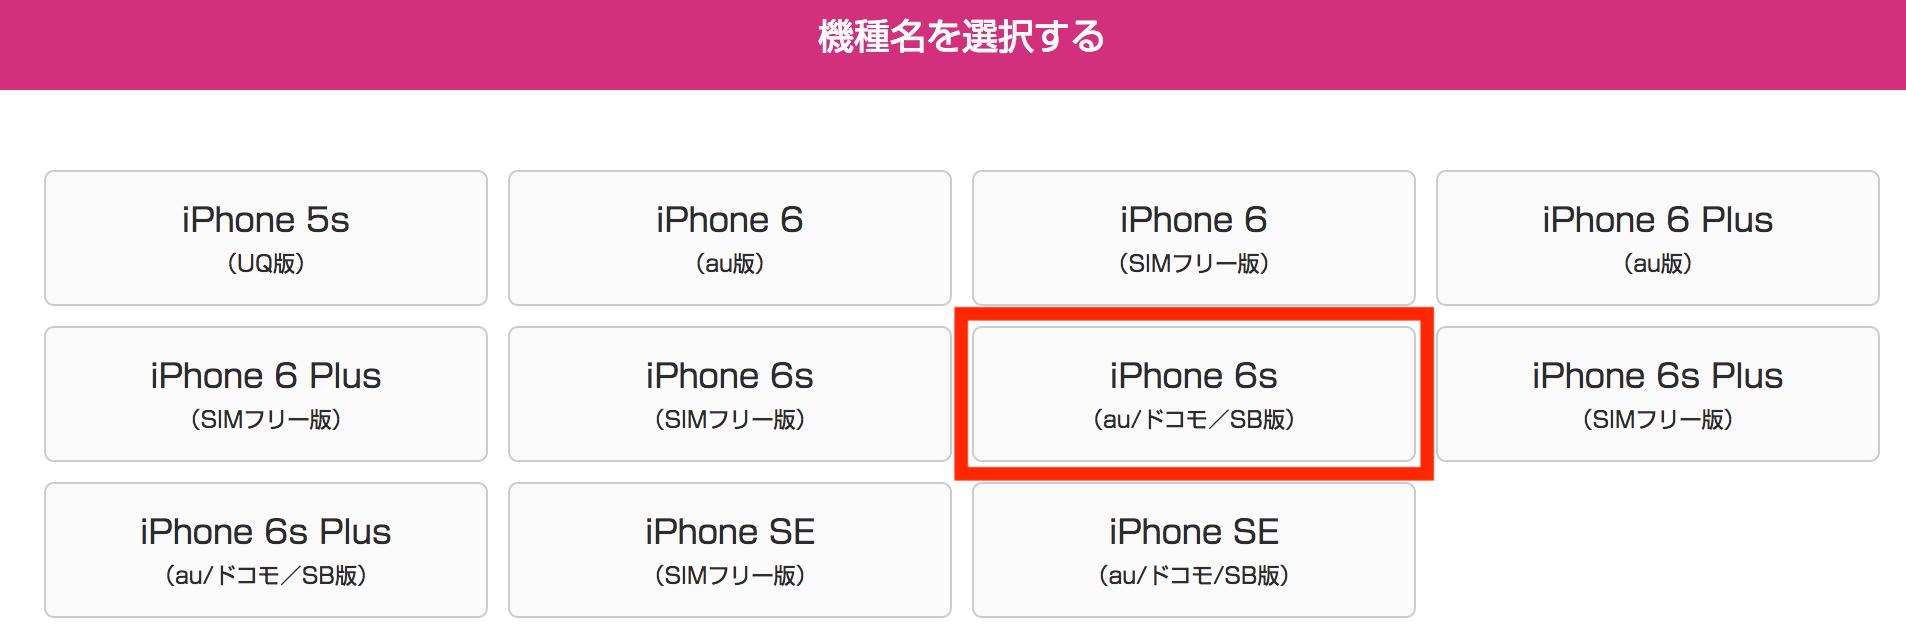 UQモバイル口座振替のiPhone6s用SIMを選択